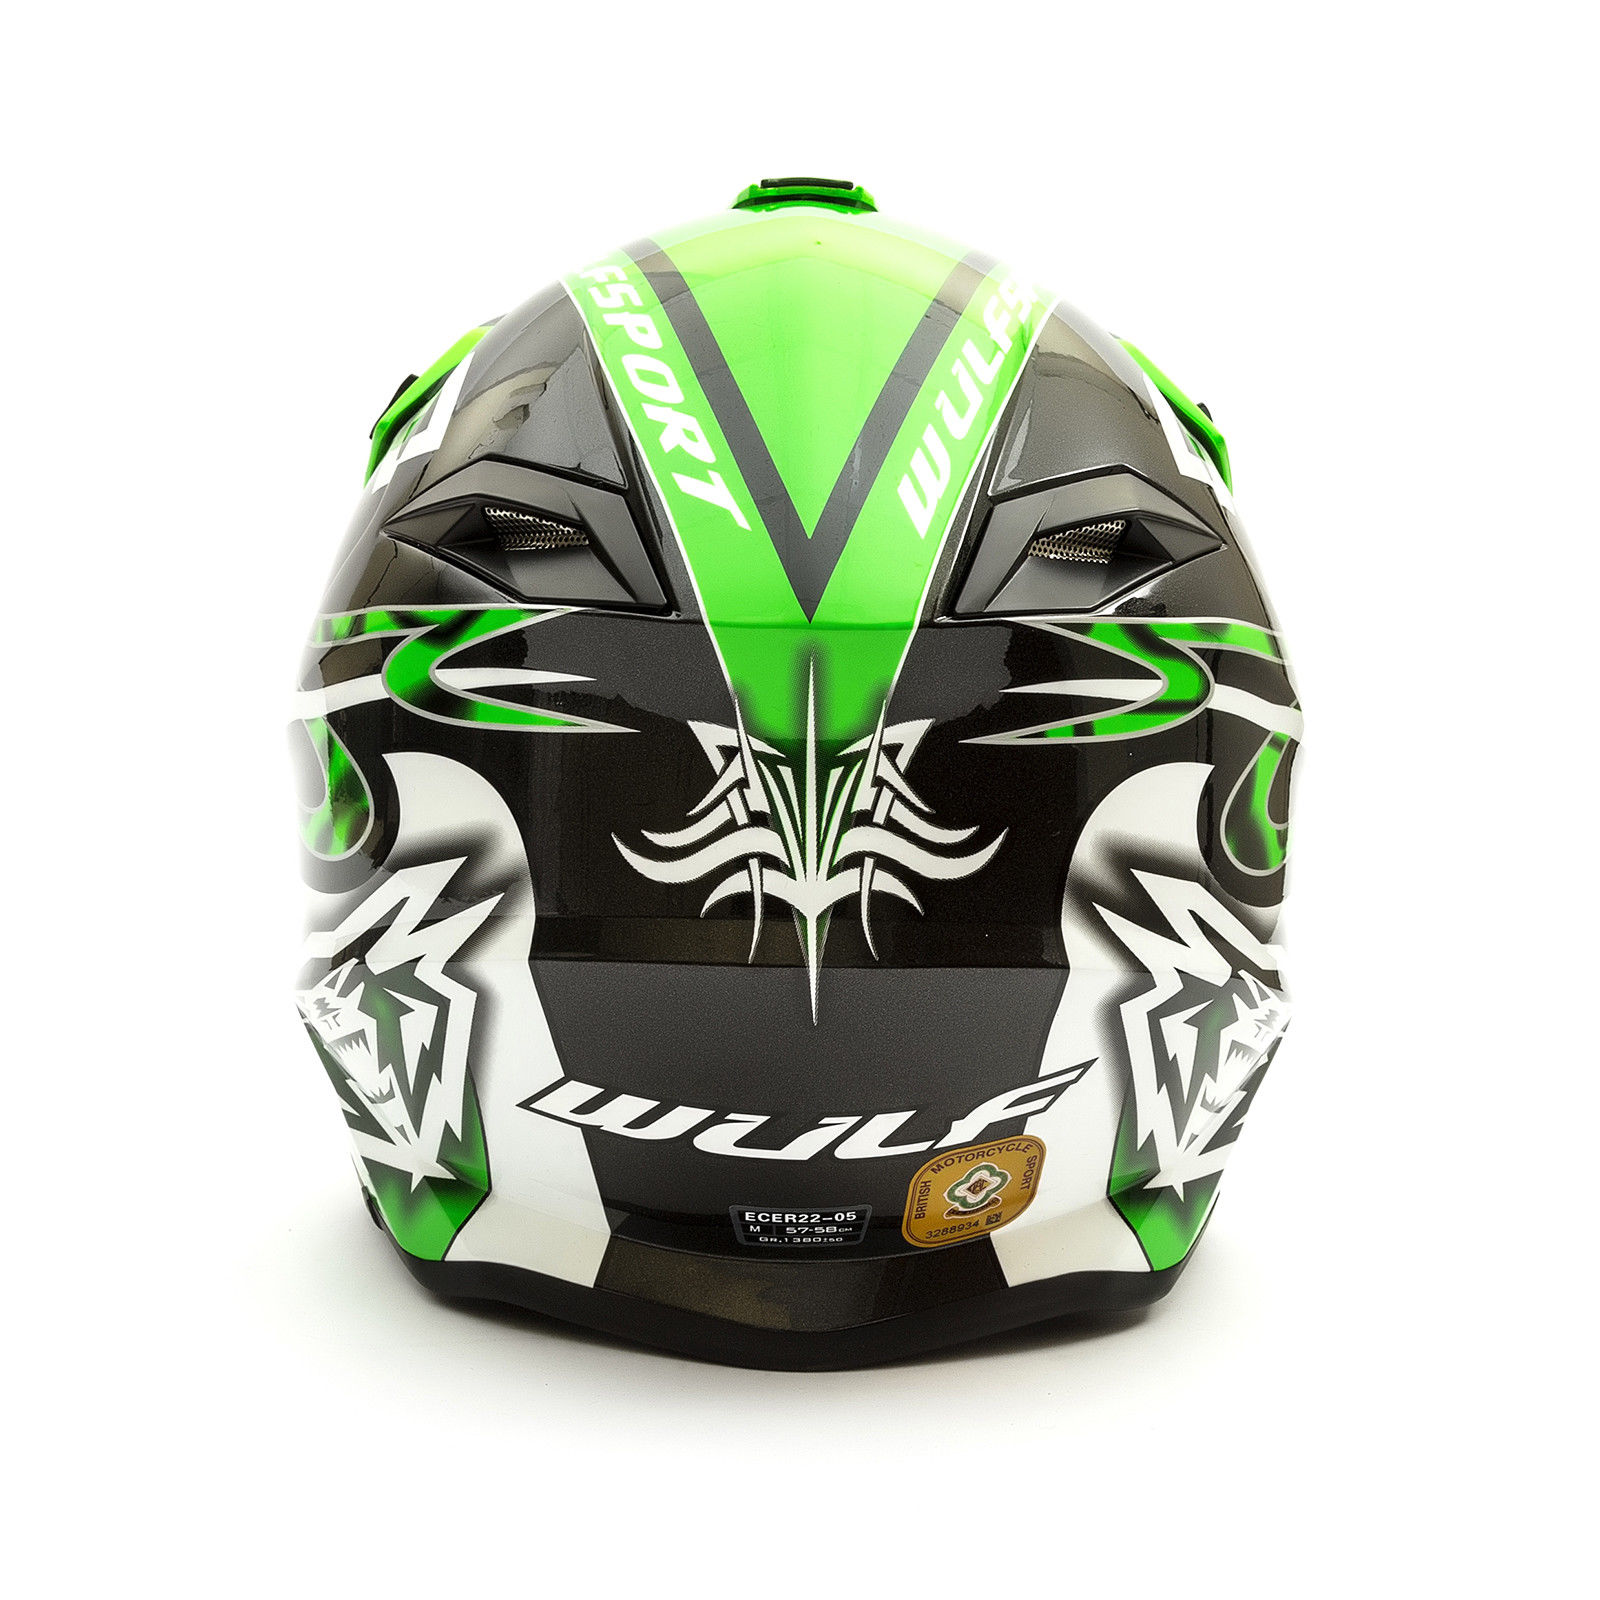 Wulfsport-Adult-Sceptre-Helmets-Motocross-Pitbike-Motorbike-Off-Road-Racing-ATV thumbnail 72